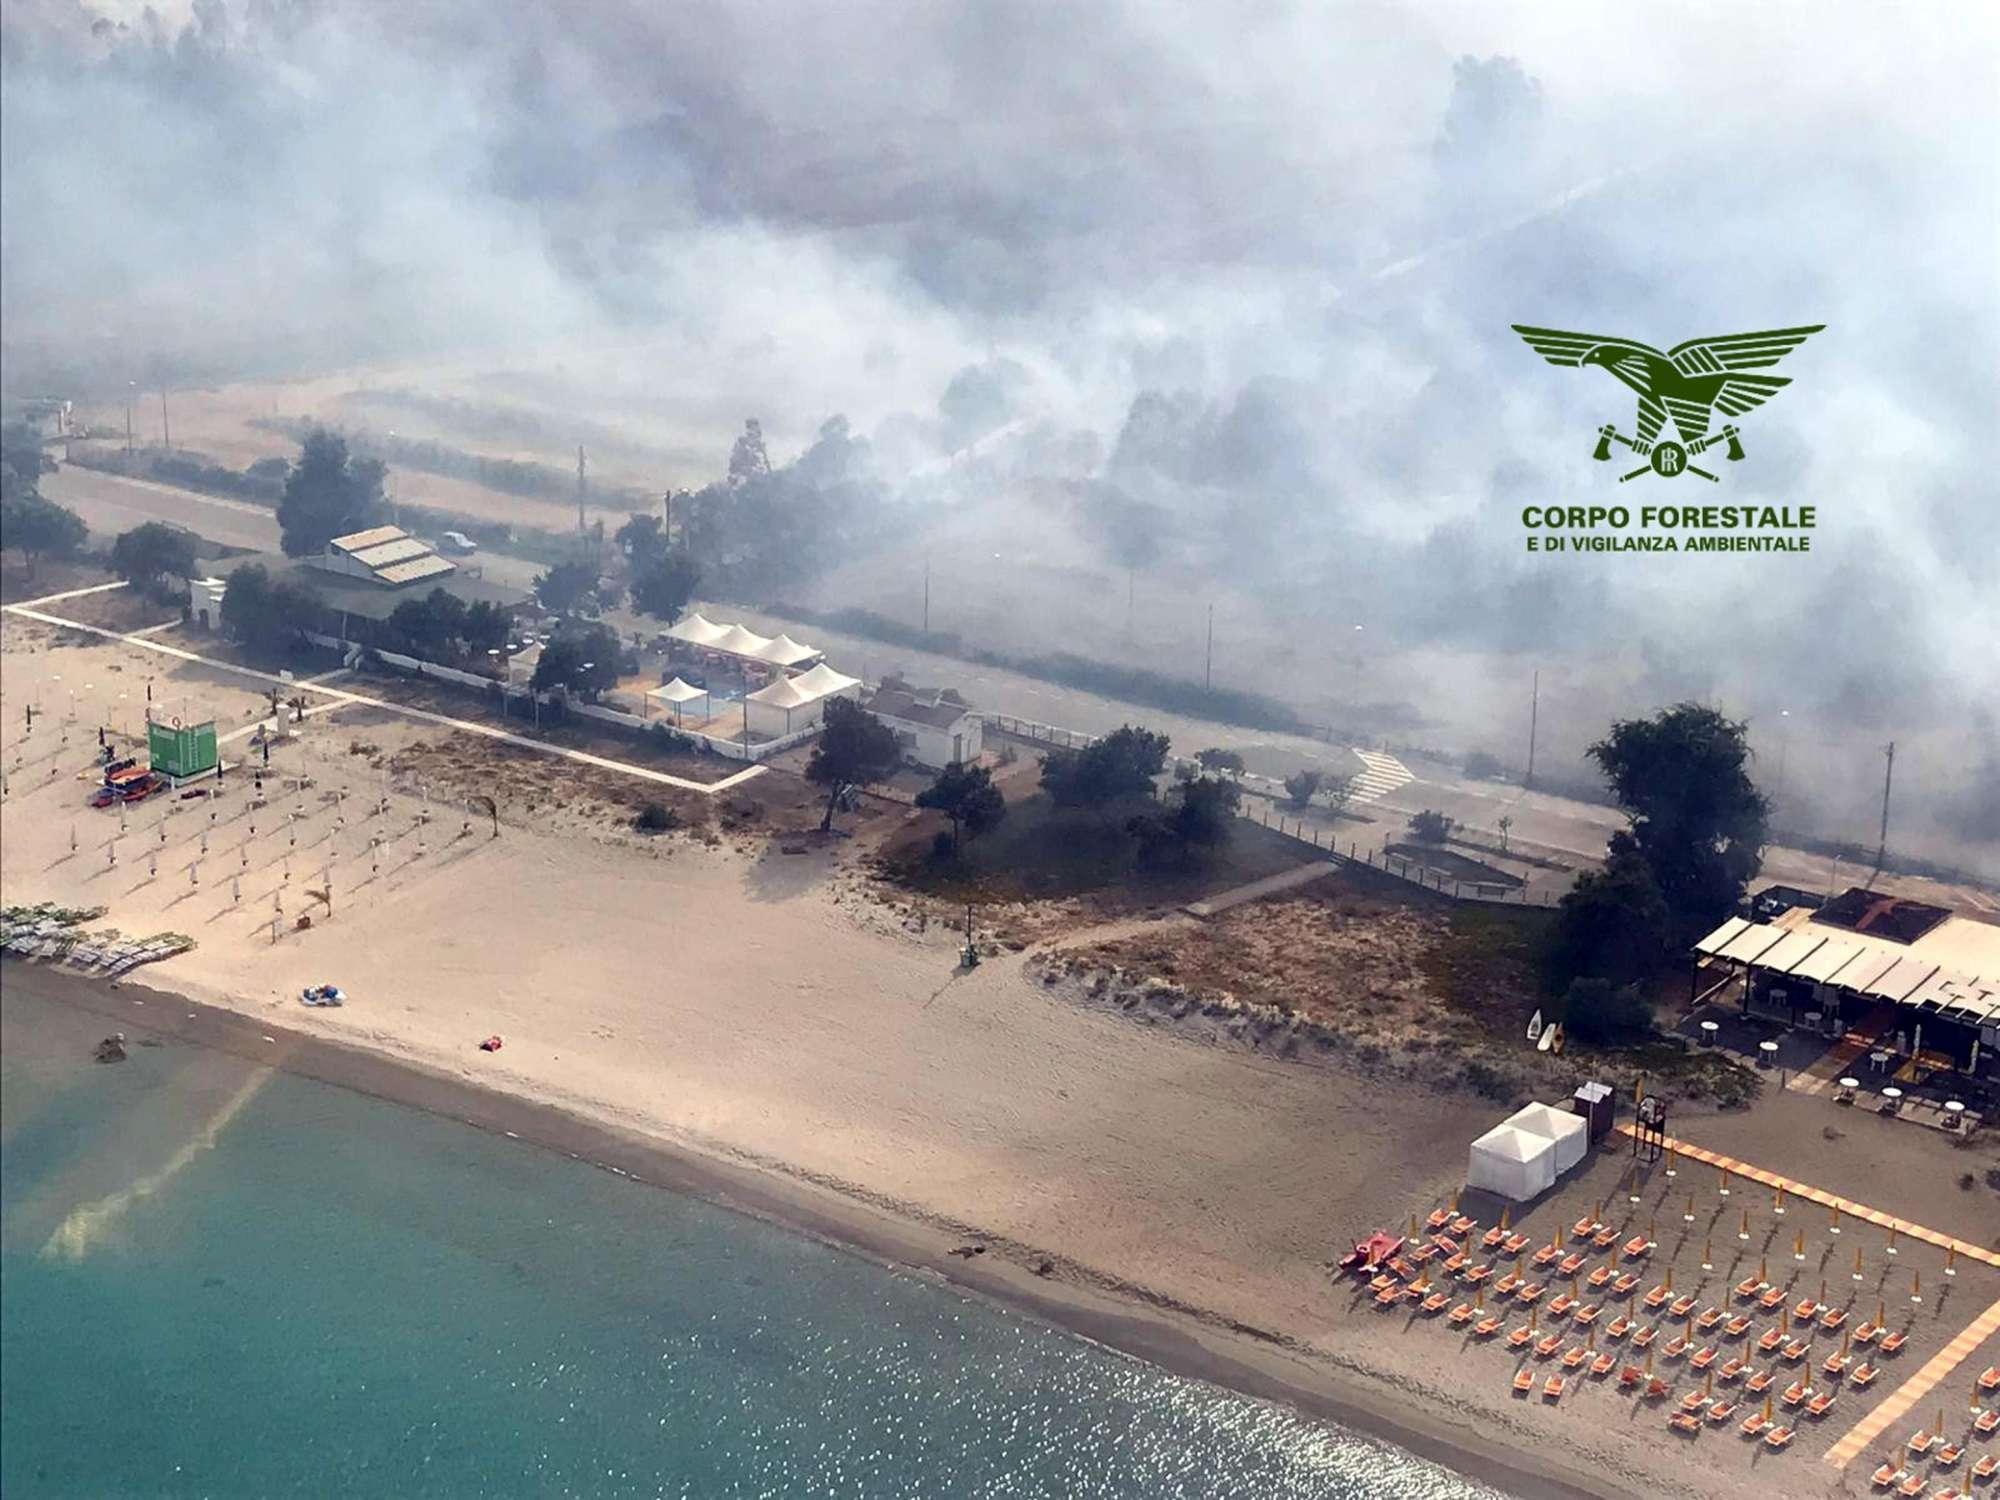 Incendi in Sardegna, evacuate case e campeggi